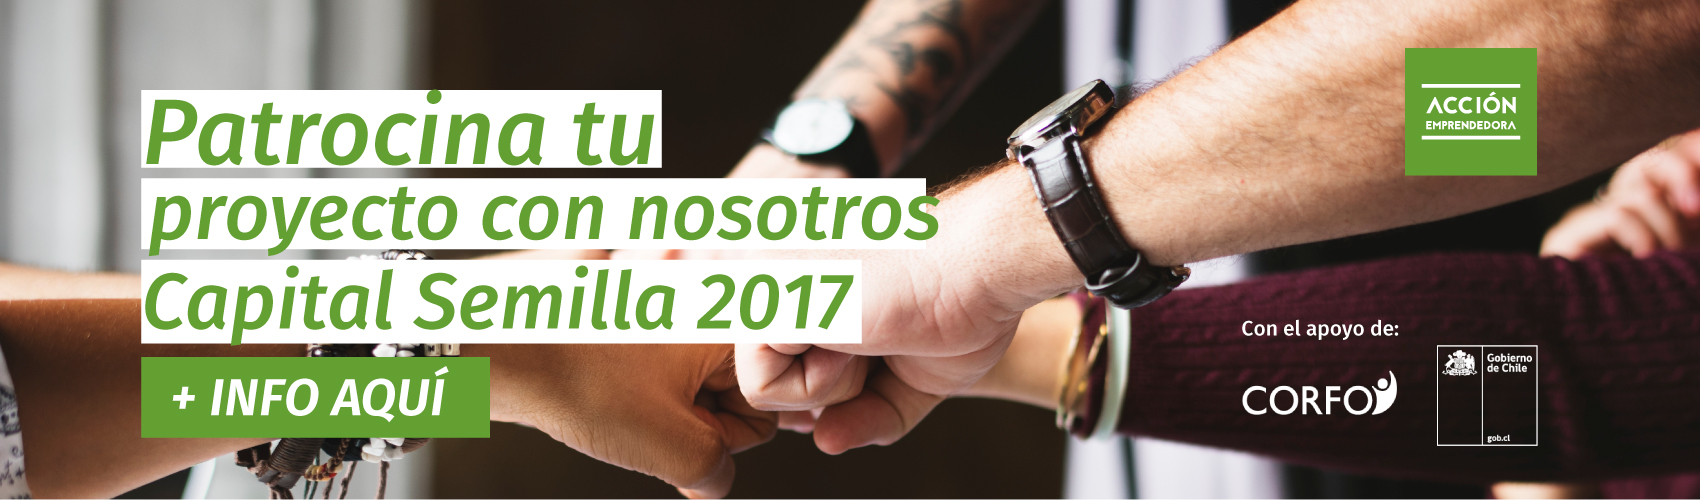 Banner-sitio-web-Capital-Semilla-2017